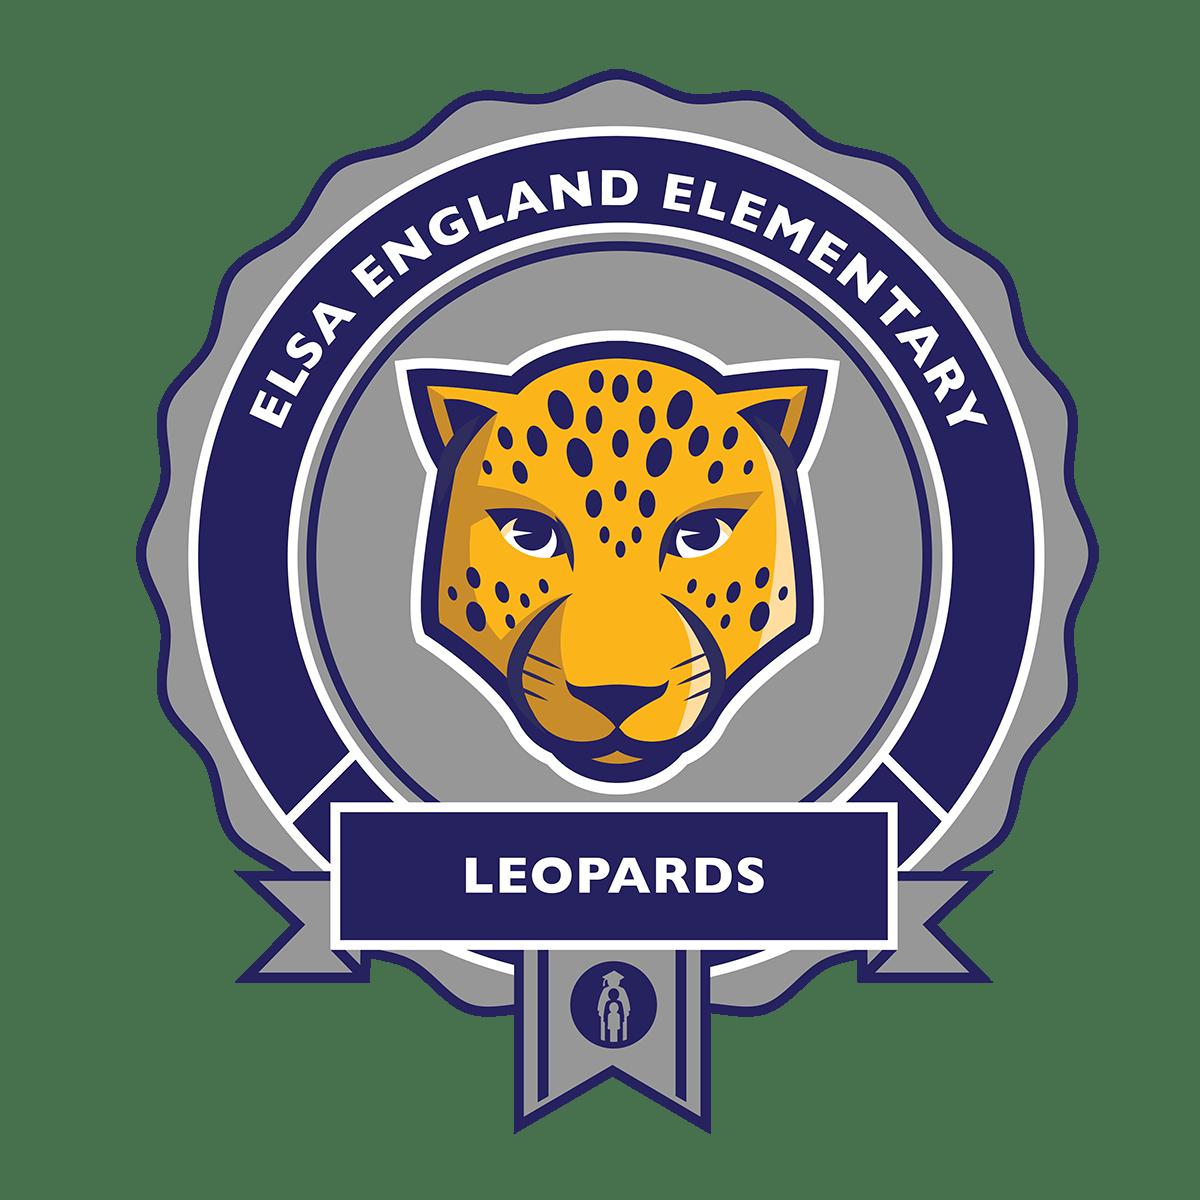 England Elementary Leopards, Est. 2012